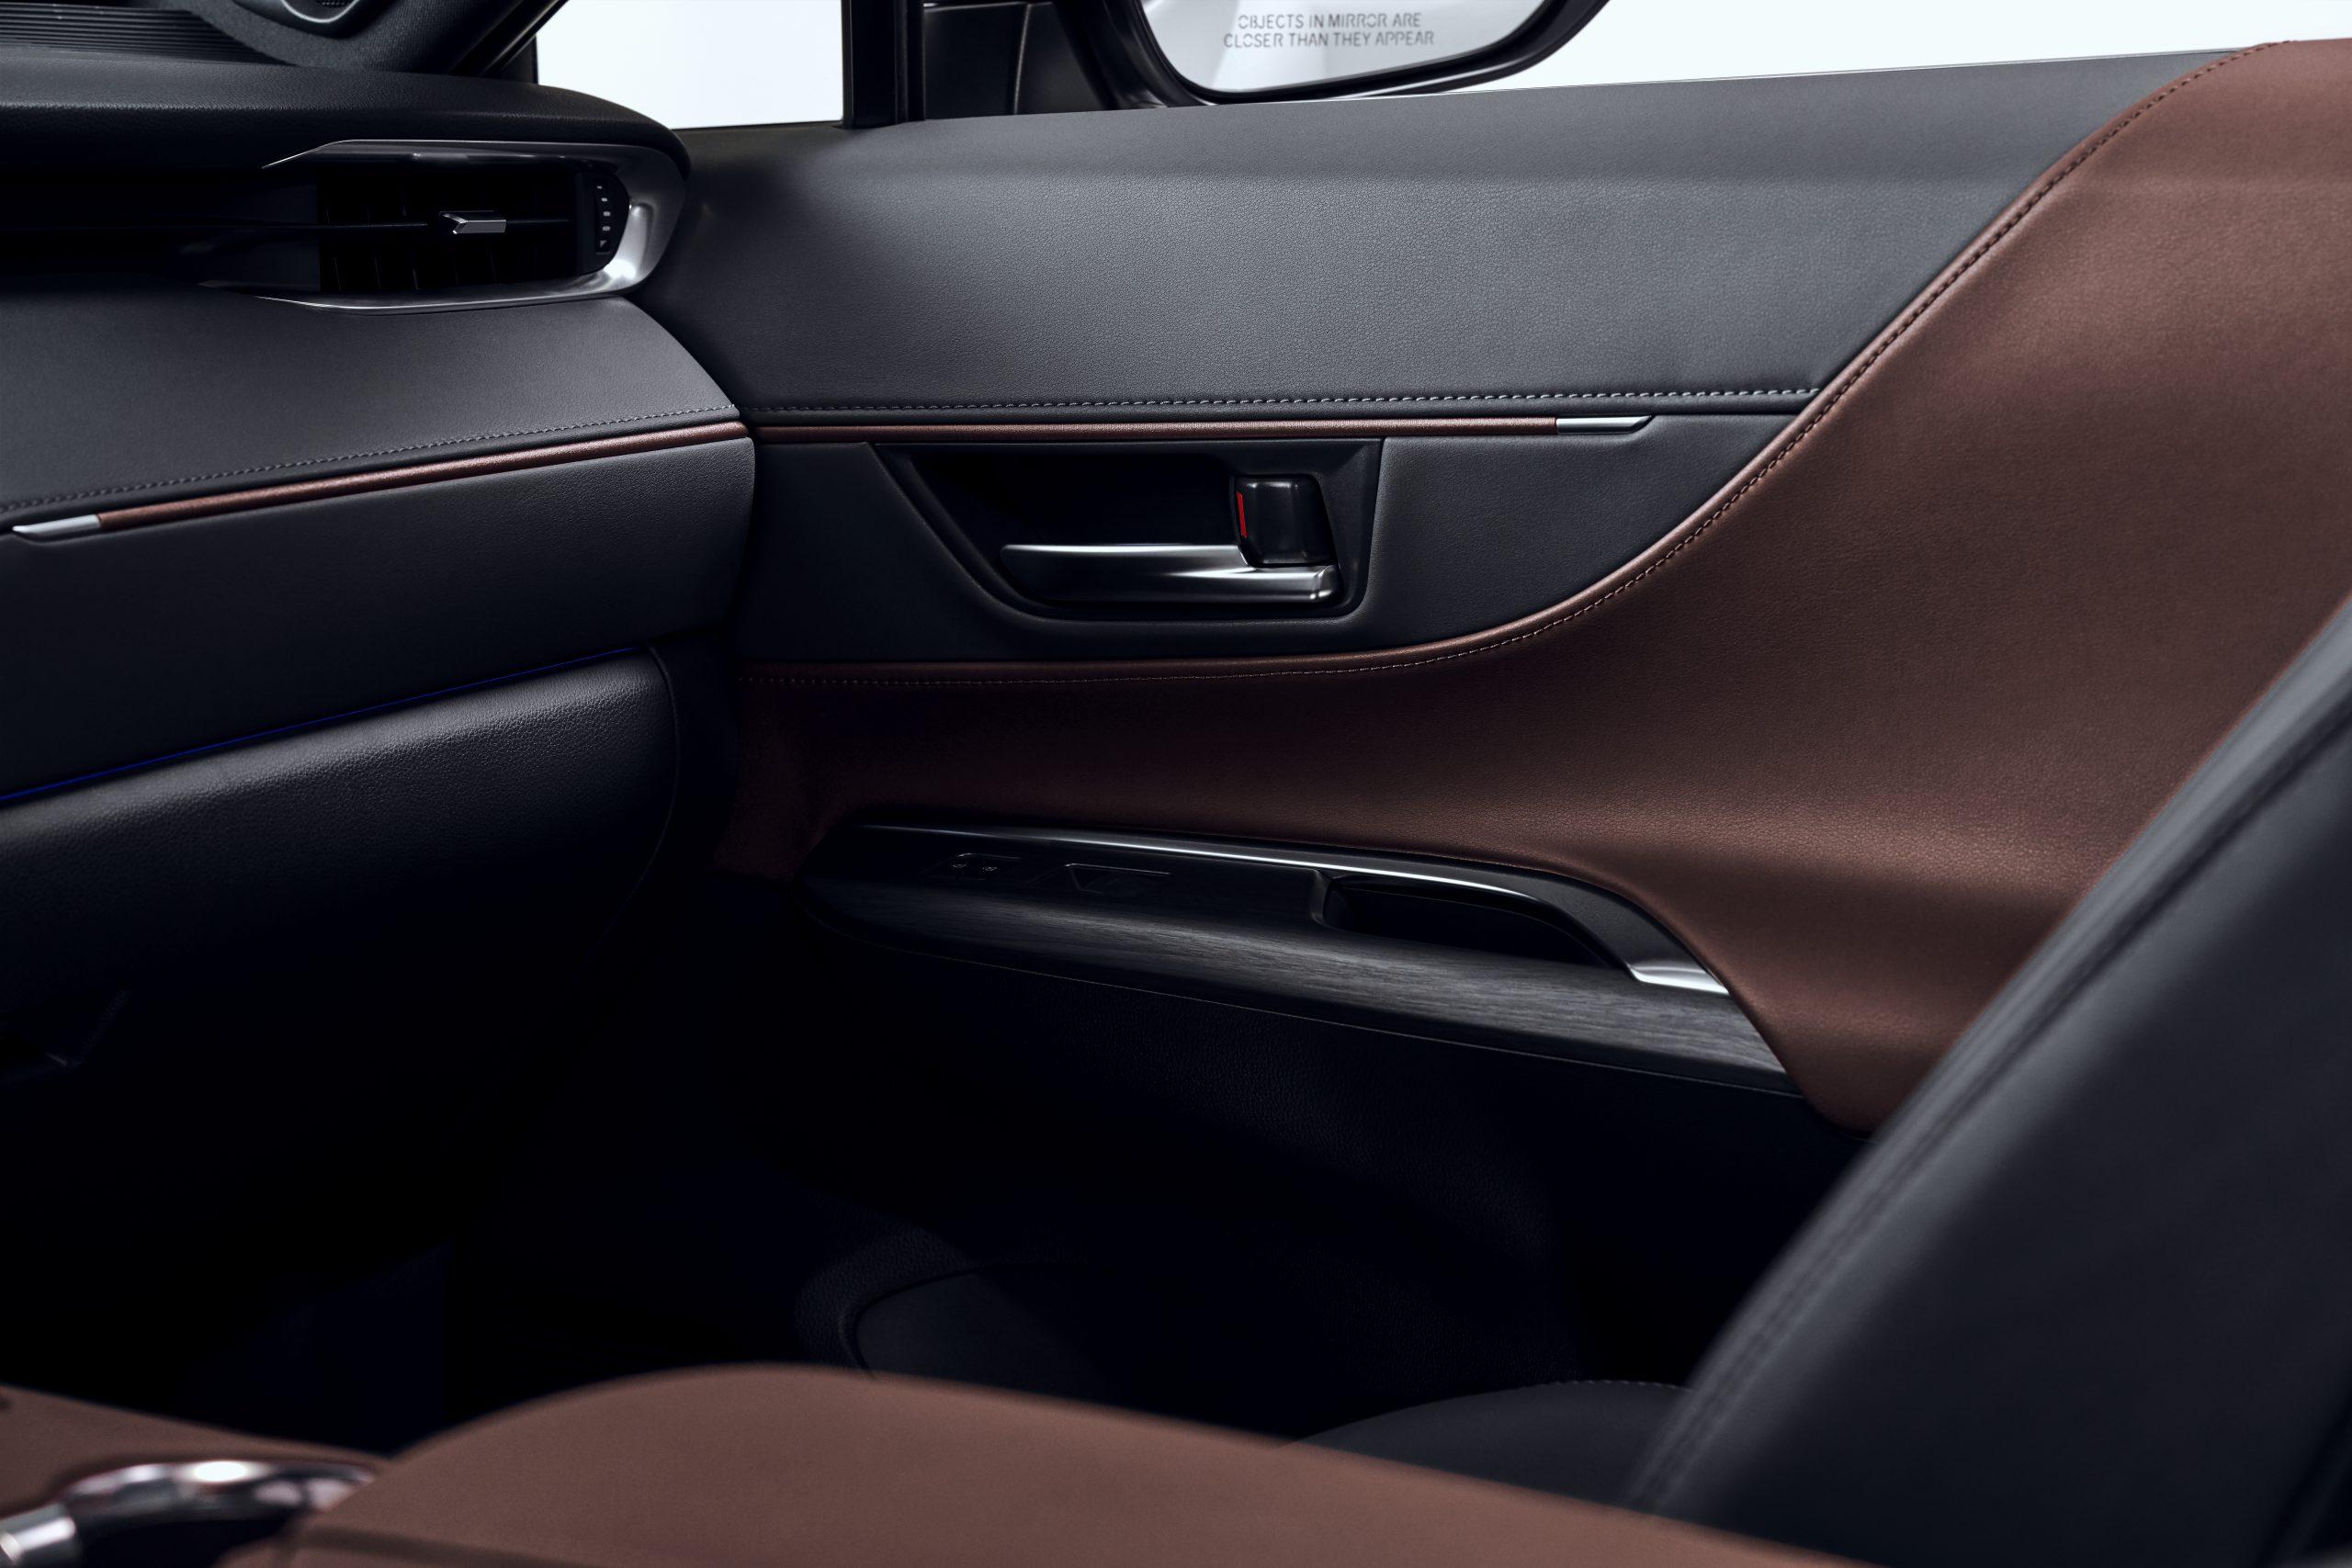 2021-Toyota-Venza_Interior_013-scaled.jpg